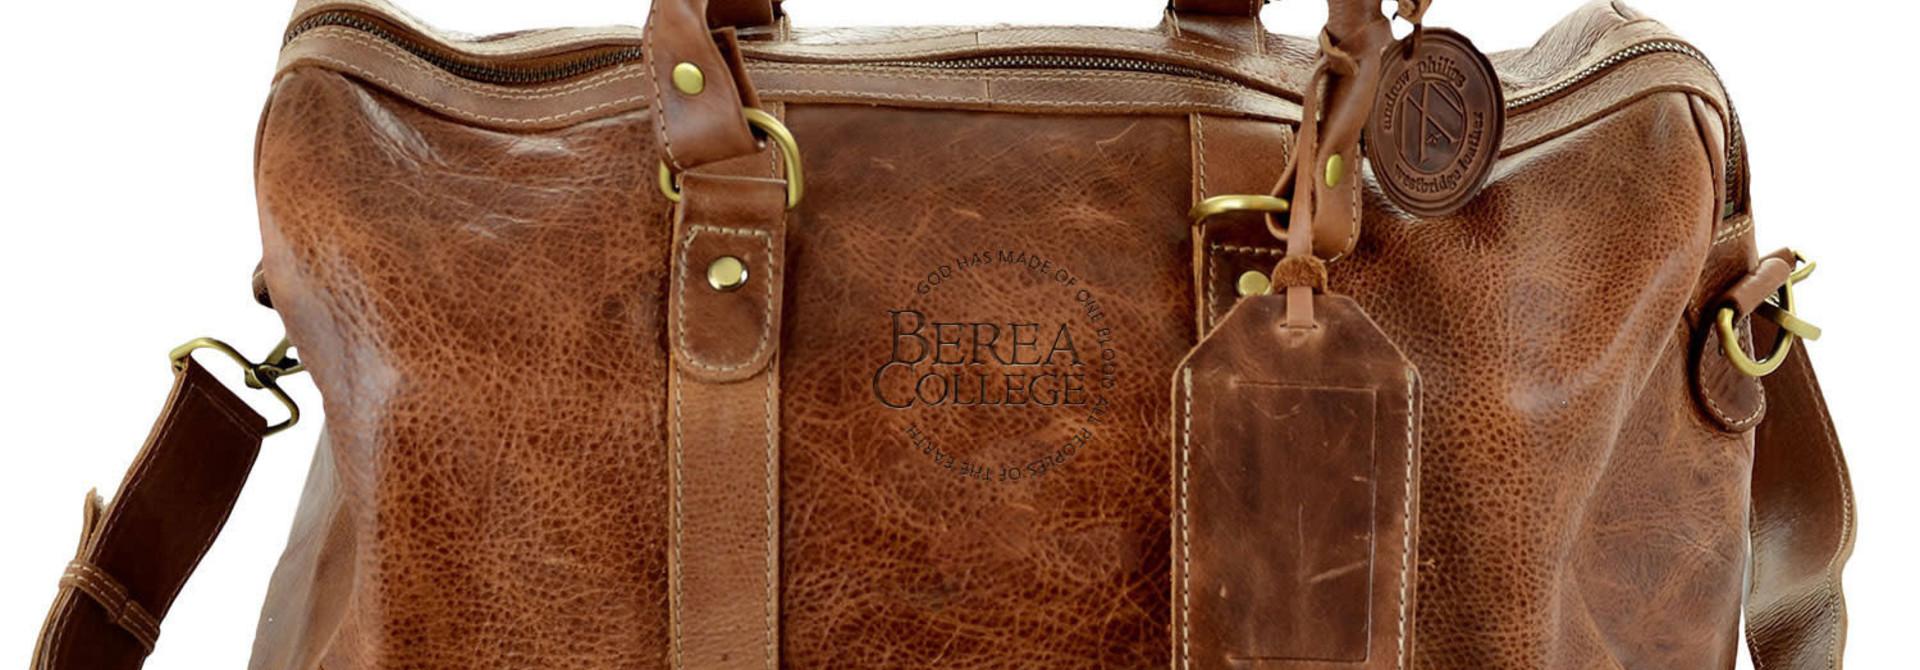 Westbridge Leather Duffel